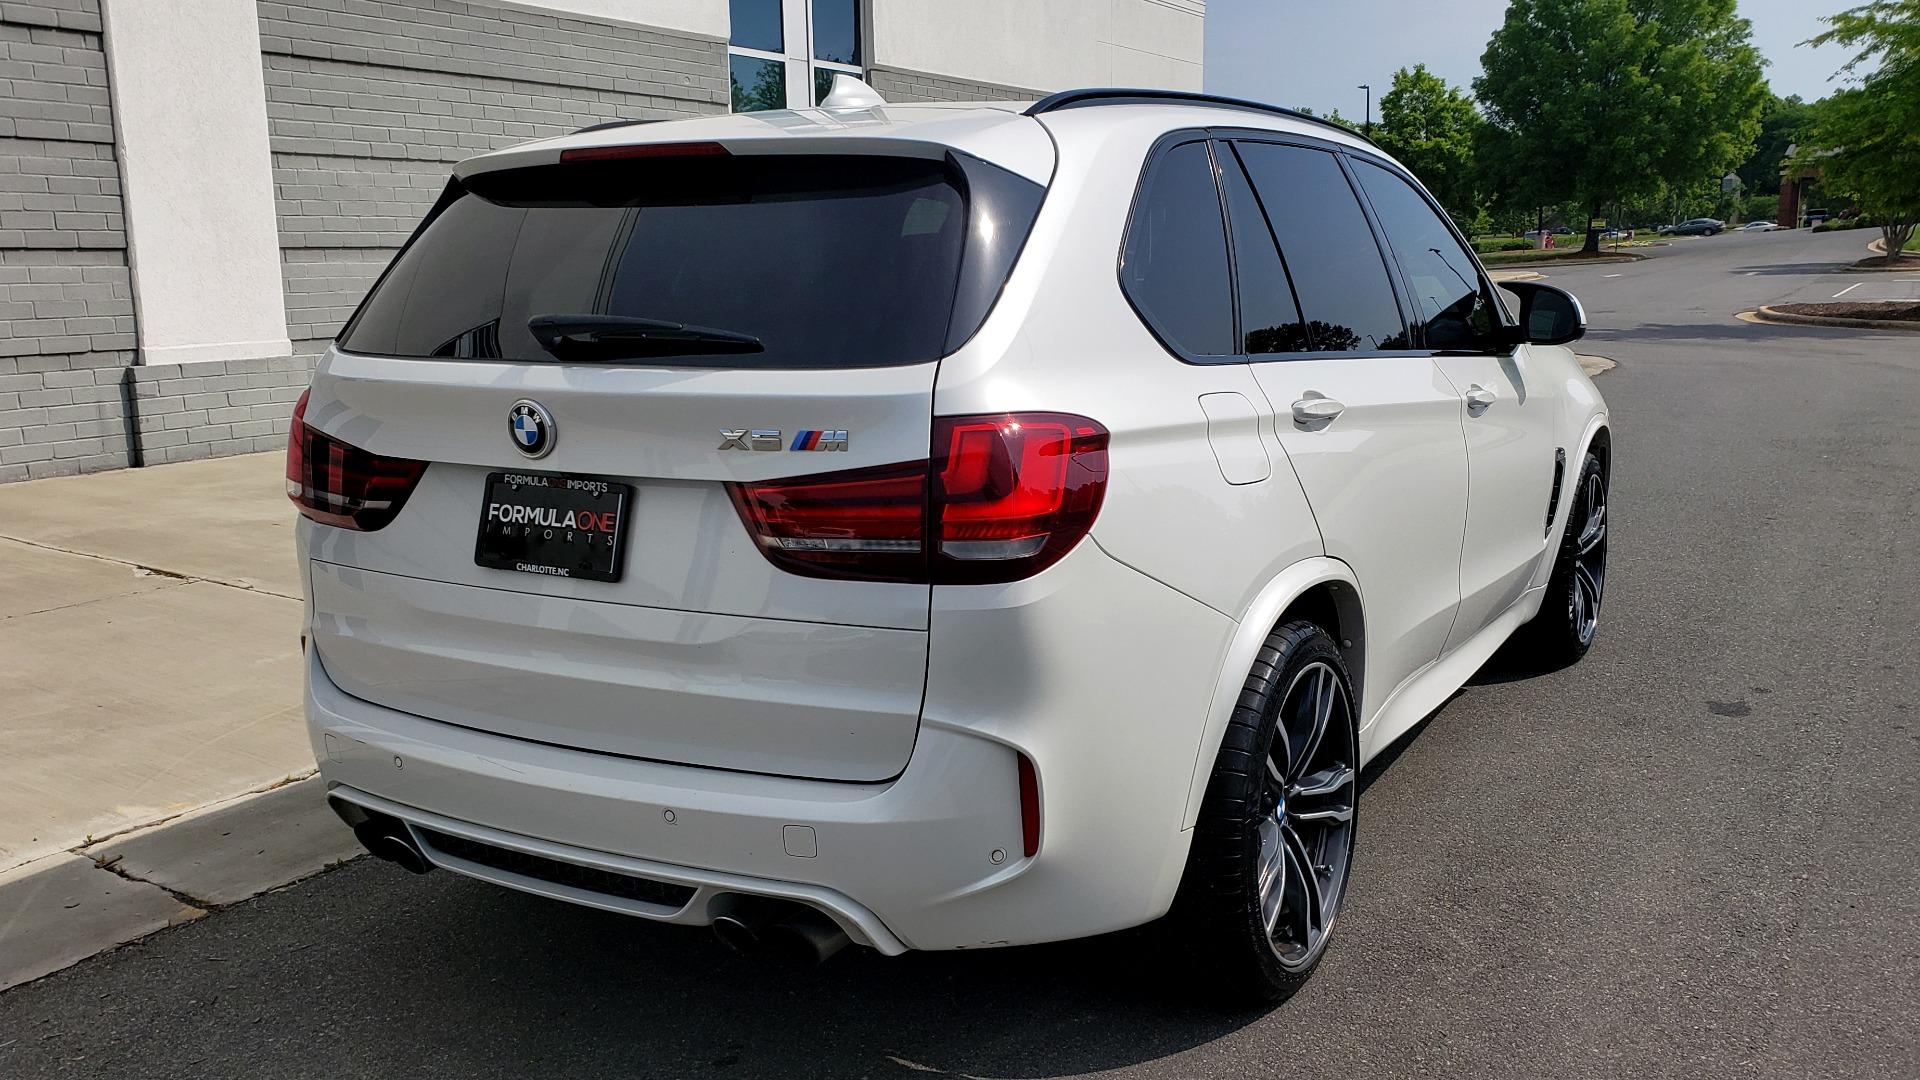 Used 2017 BMW X5 M EXECUTIVE PKG / NAV / DRVR ASST / BSM / HUD / HTD STS / WIFI for sale Sold at Formula Imports in Charlotte NC 28227 4